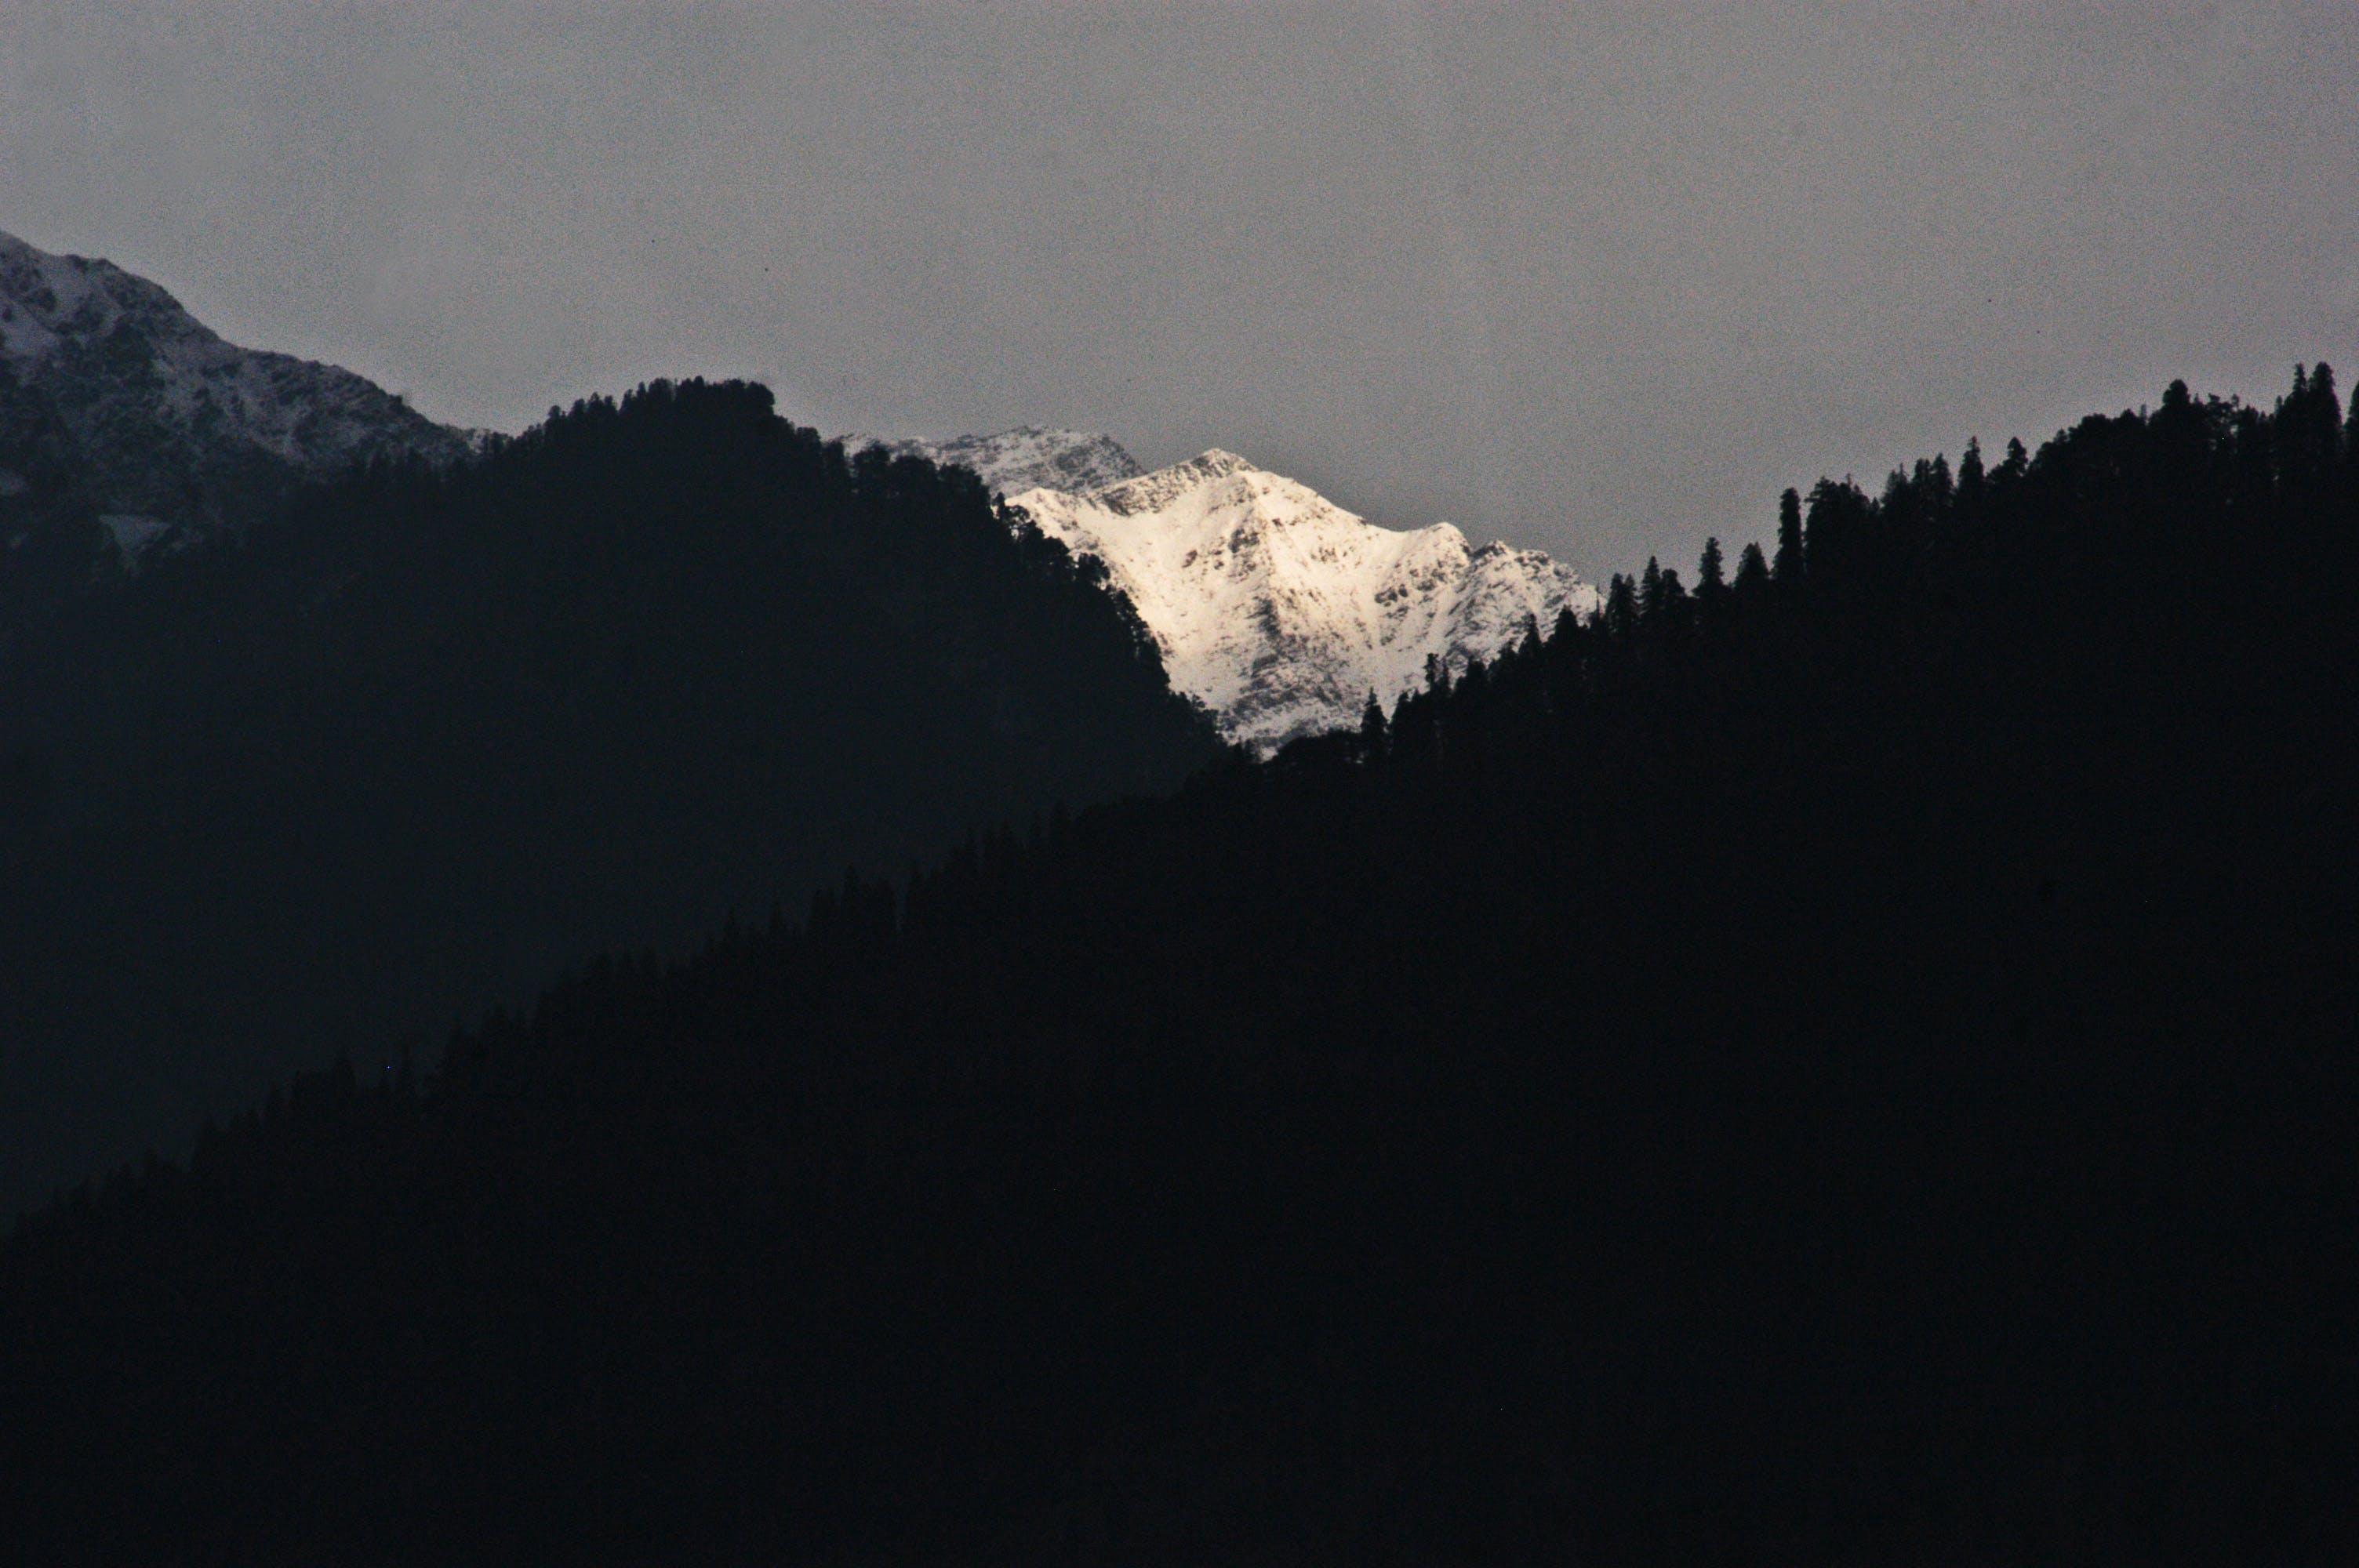 Free stock photo of Himalayan Hamlet, himalayas, india, landscape photography